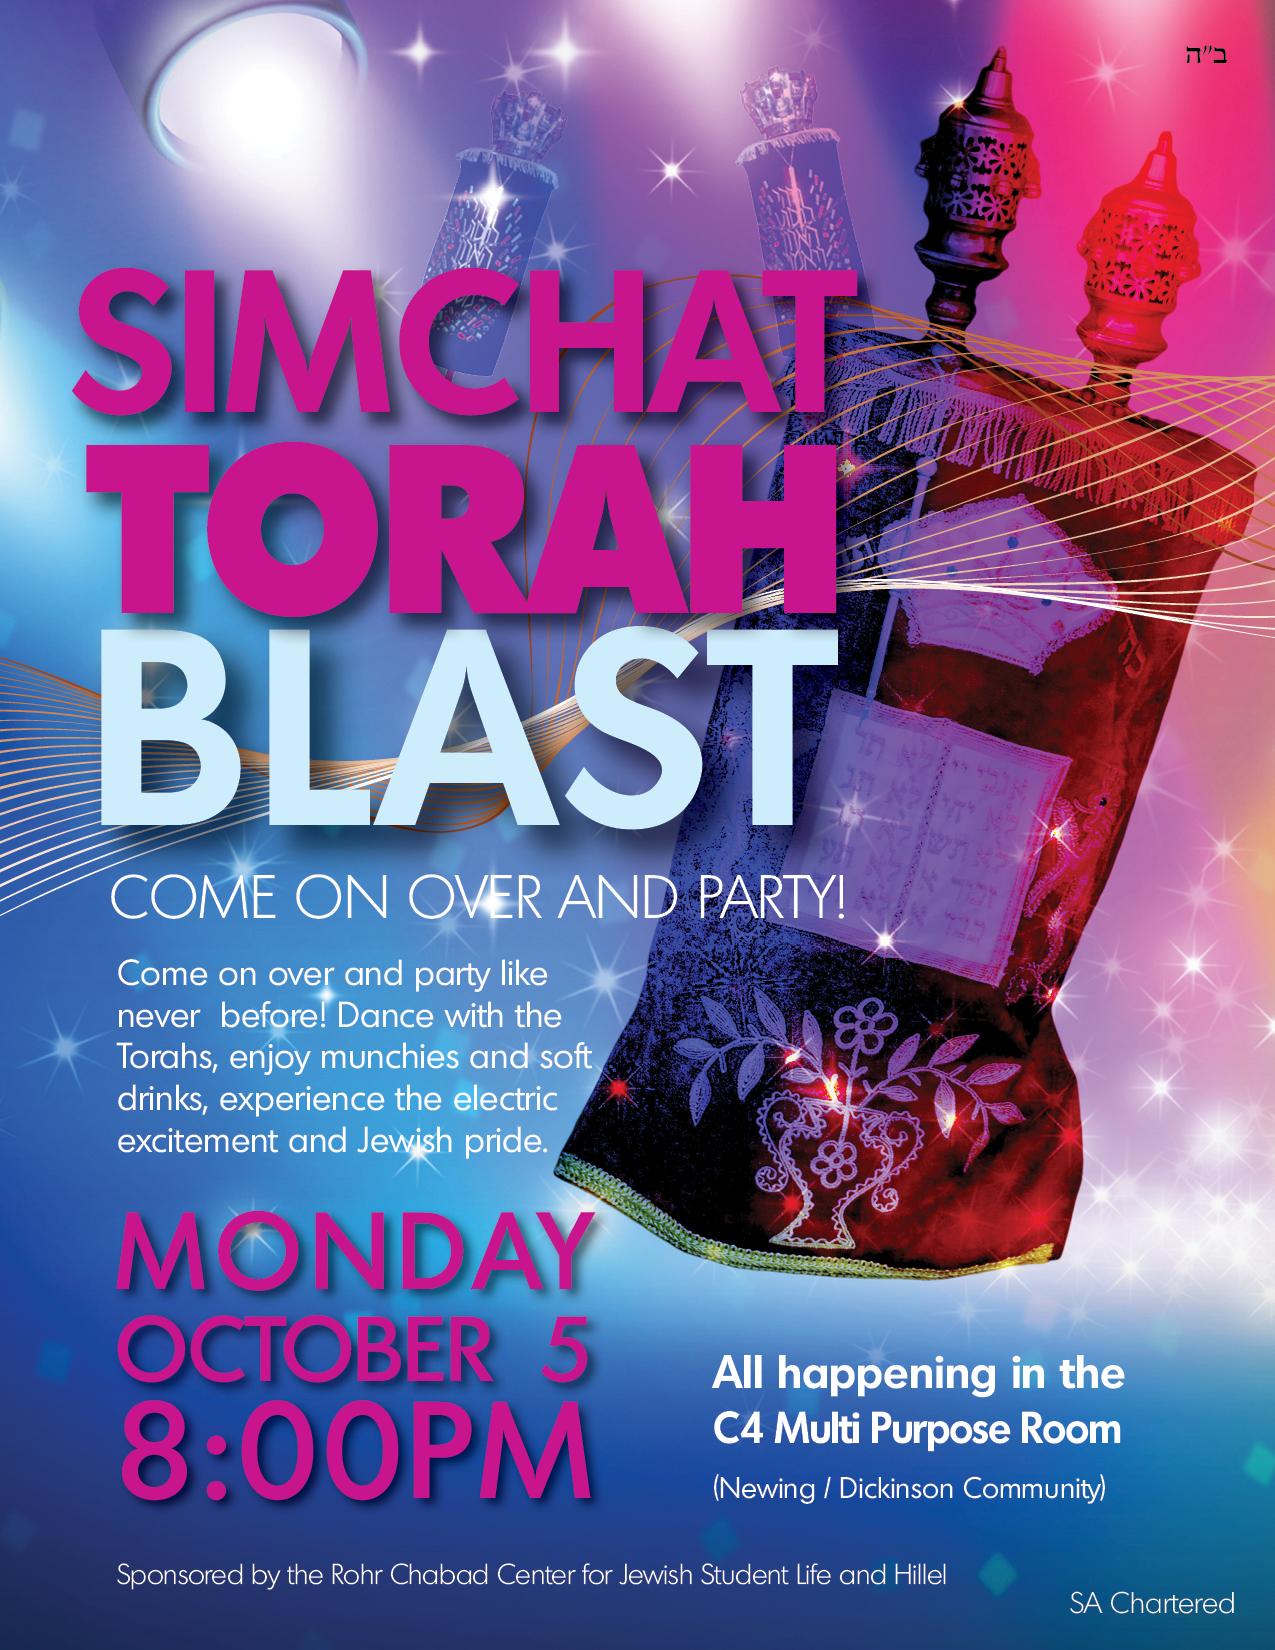 Simchat Torah Blast 15 10515 Rohr Chabad Center For Jewish